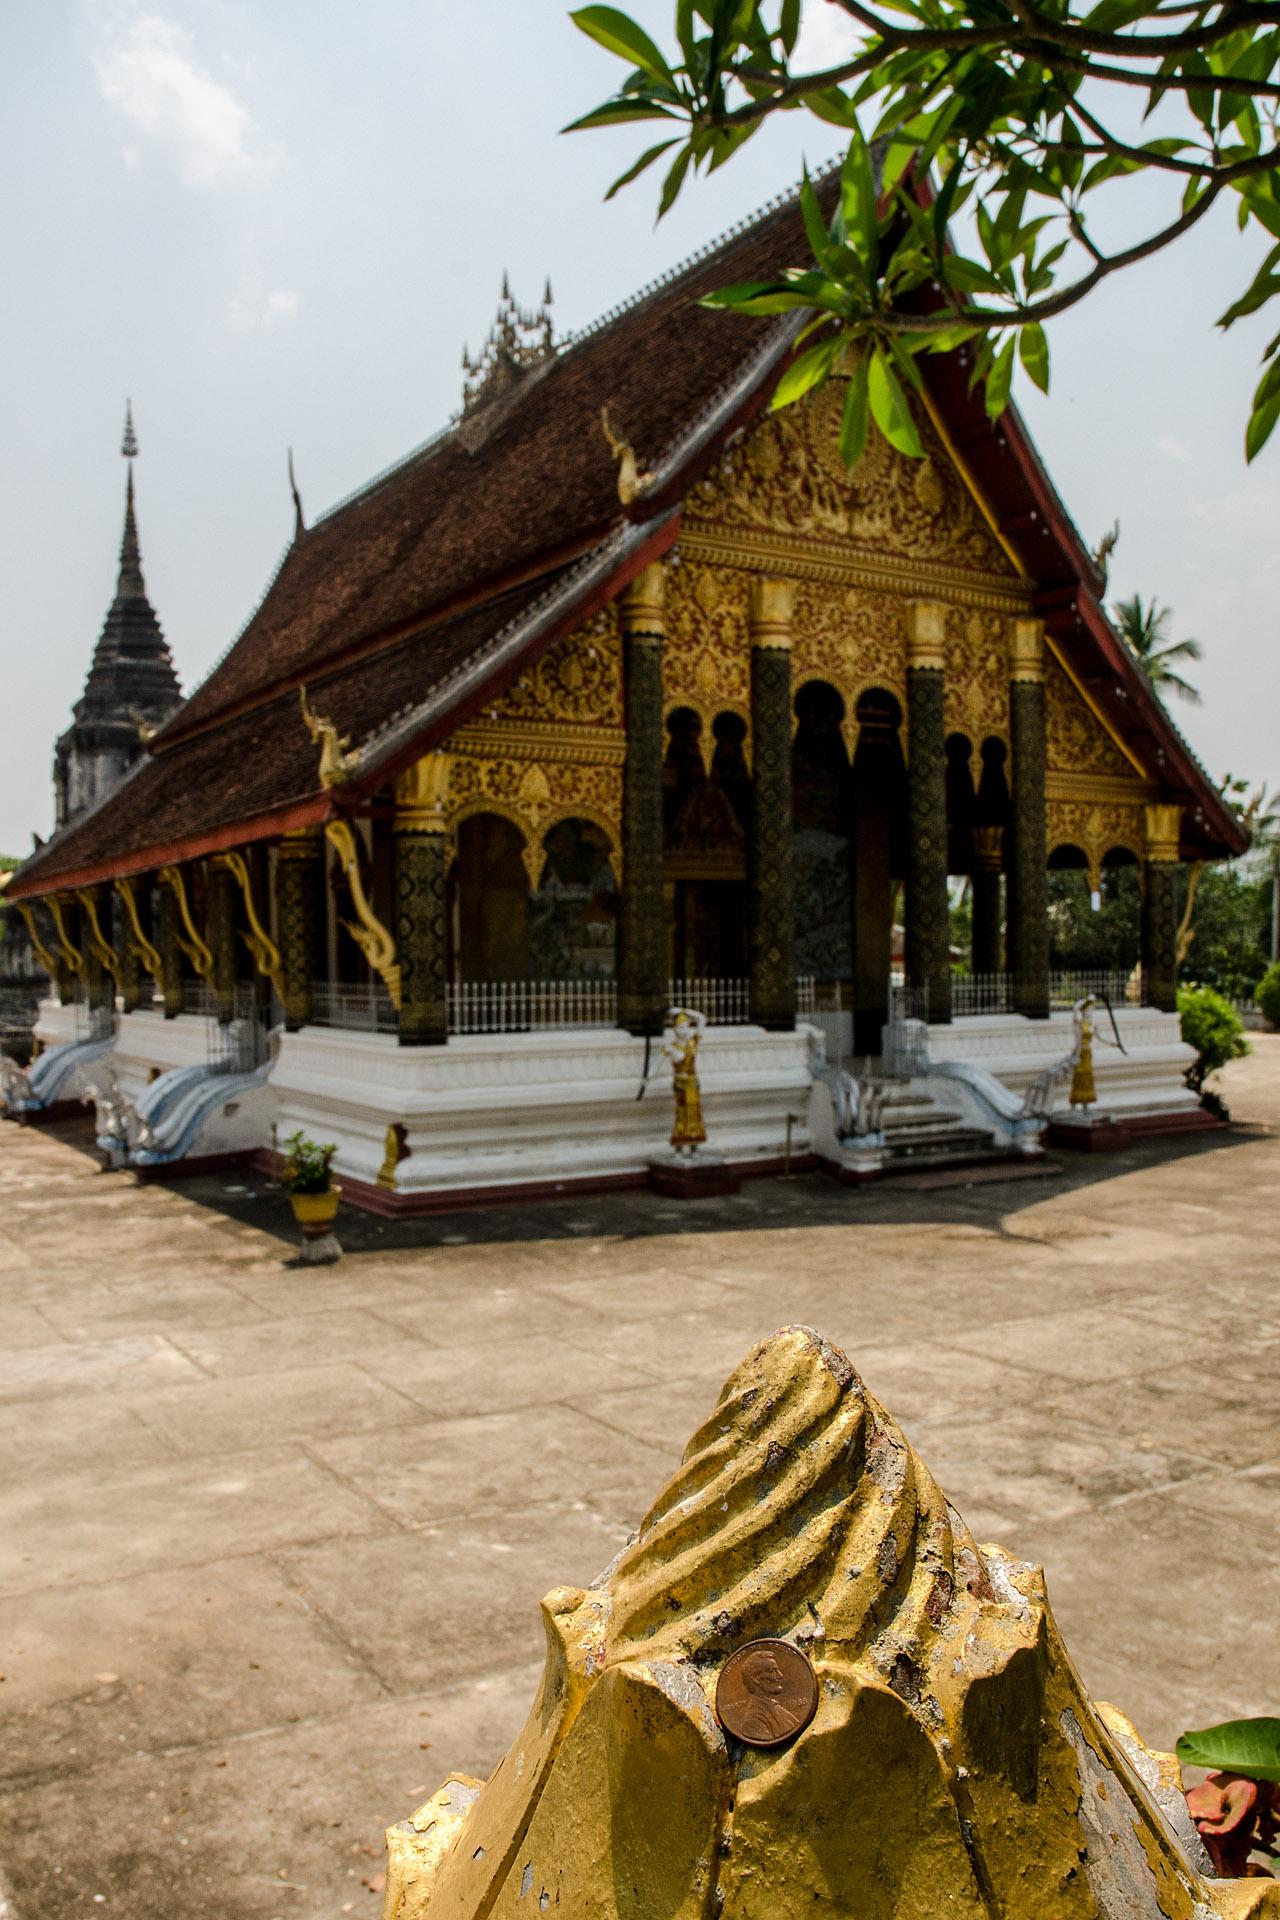 Wat Mahathat (Luang Prabang)